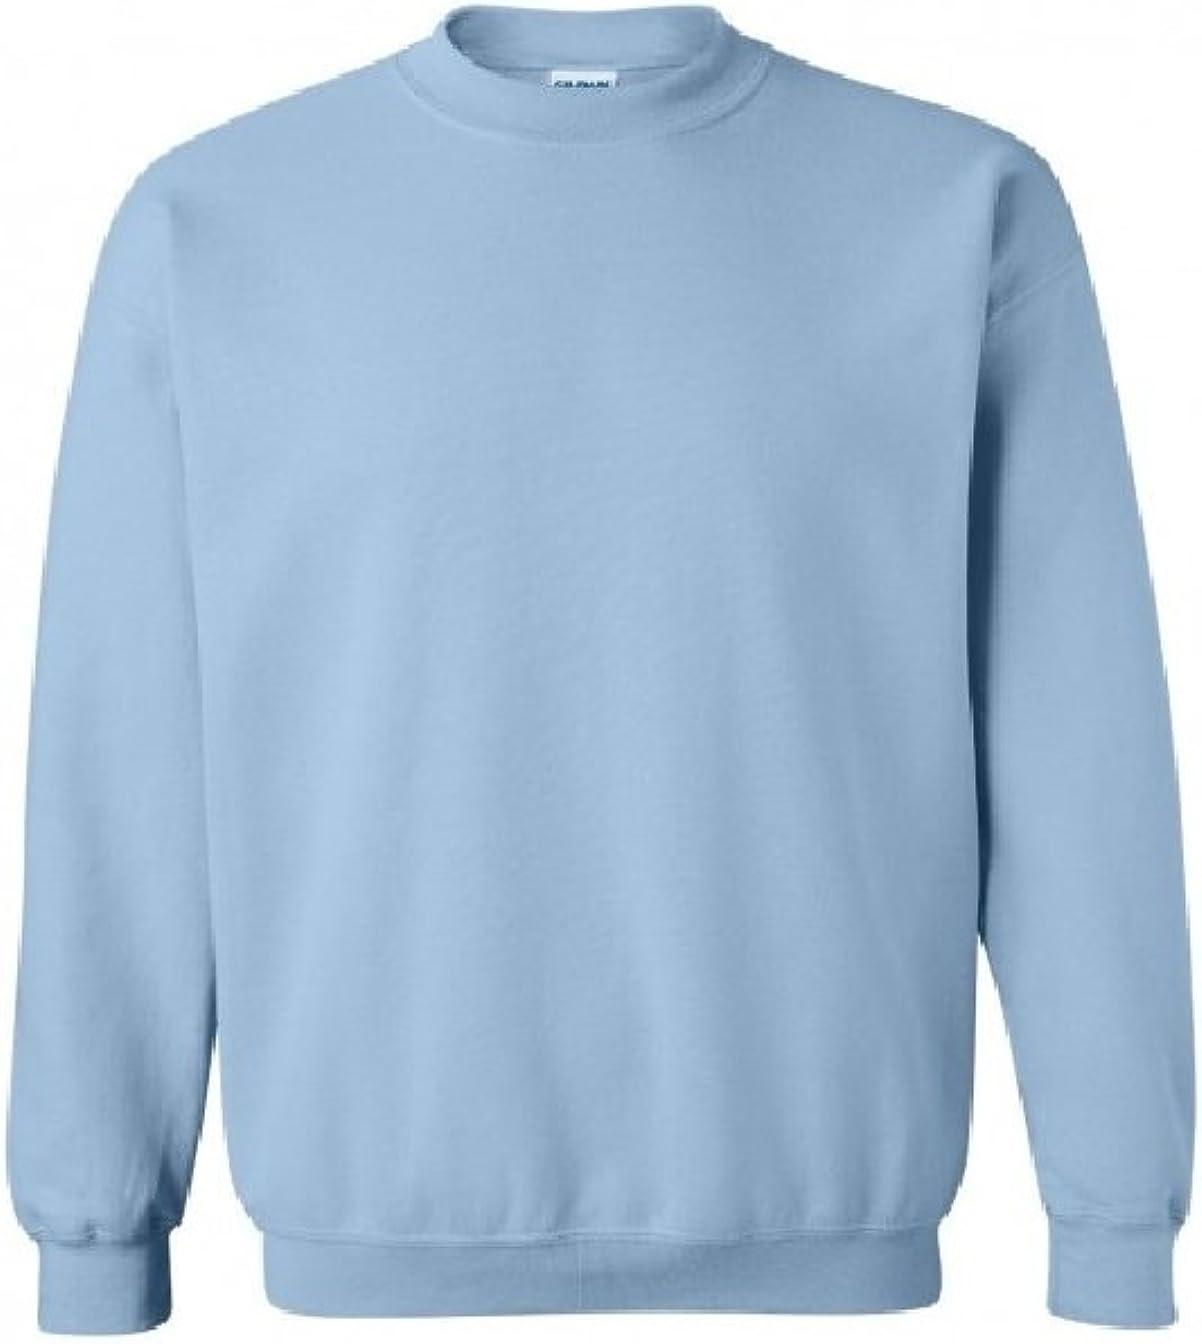 Gildan 50//50 Adult Crew Neck Super Soft Plain Sweatshirt